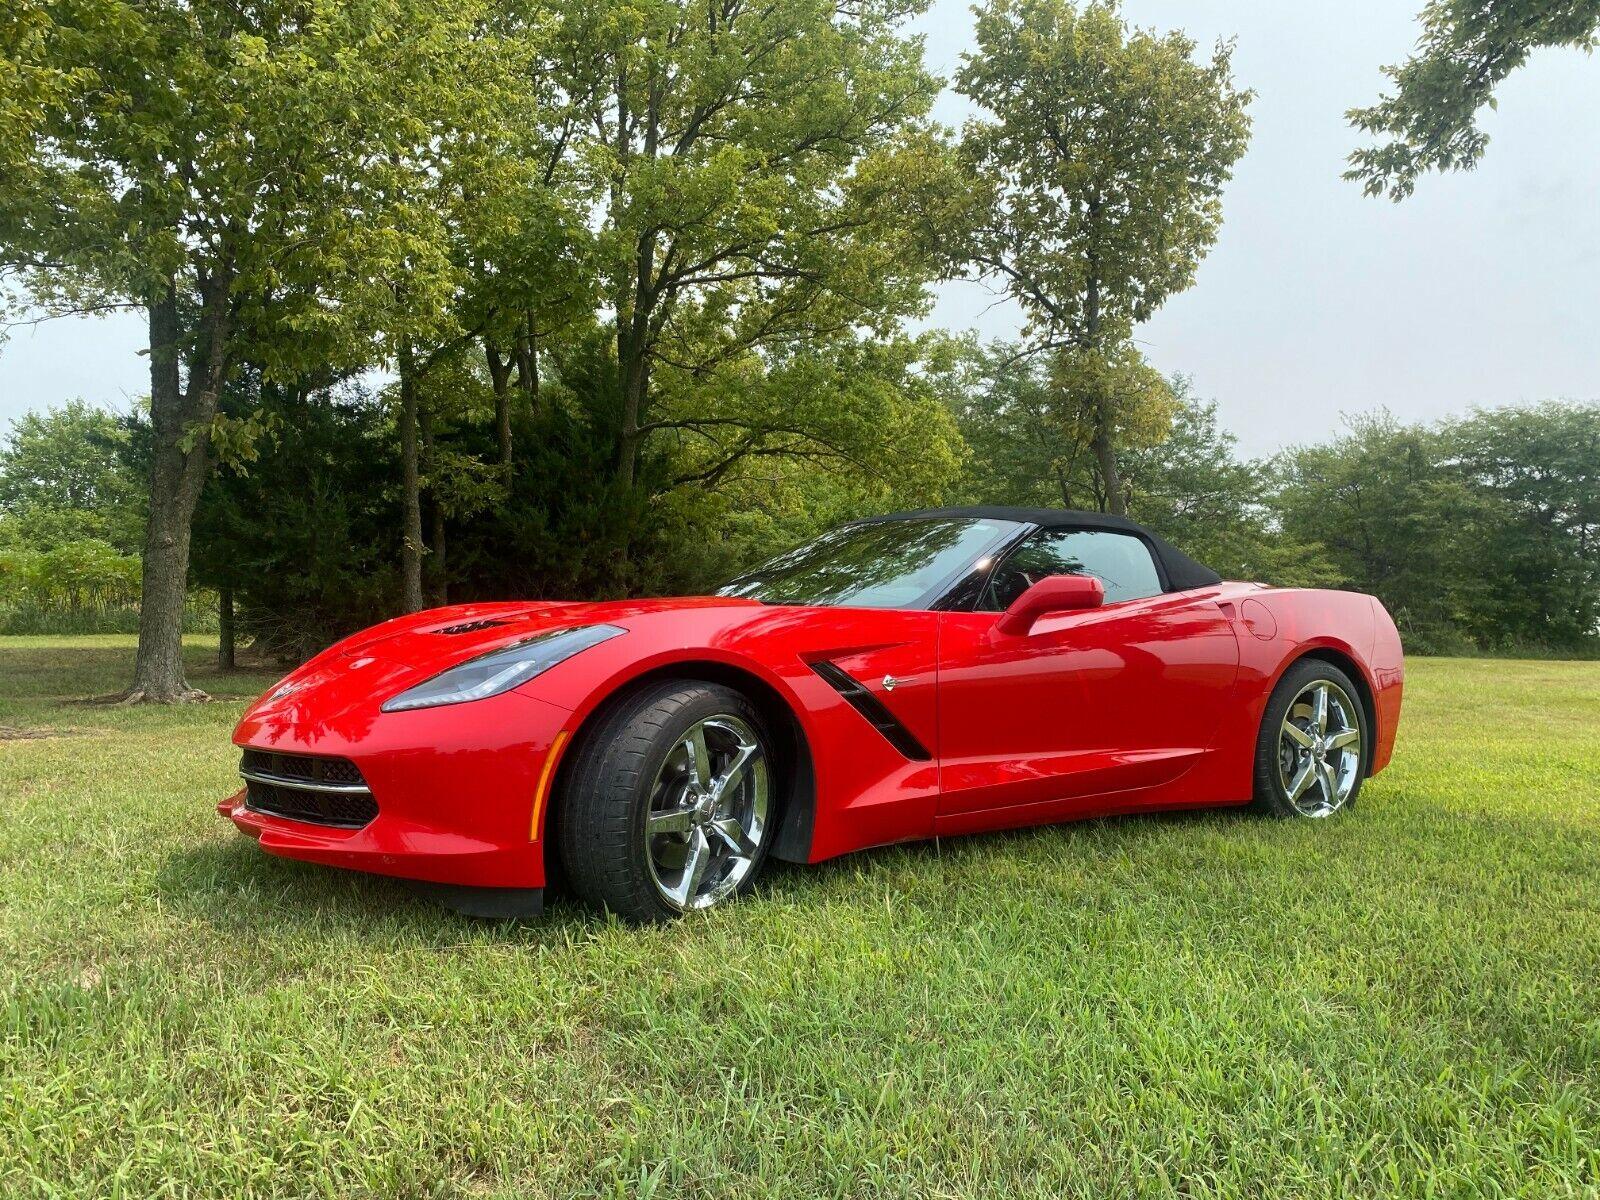 2014 Red Chevrolet Corvette     C7 Corvette Photo 1